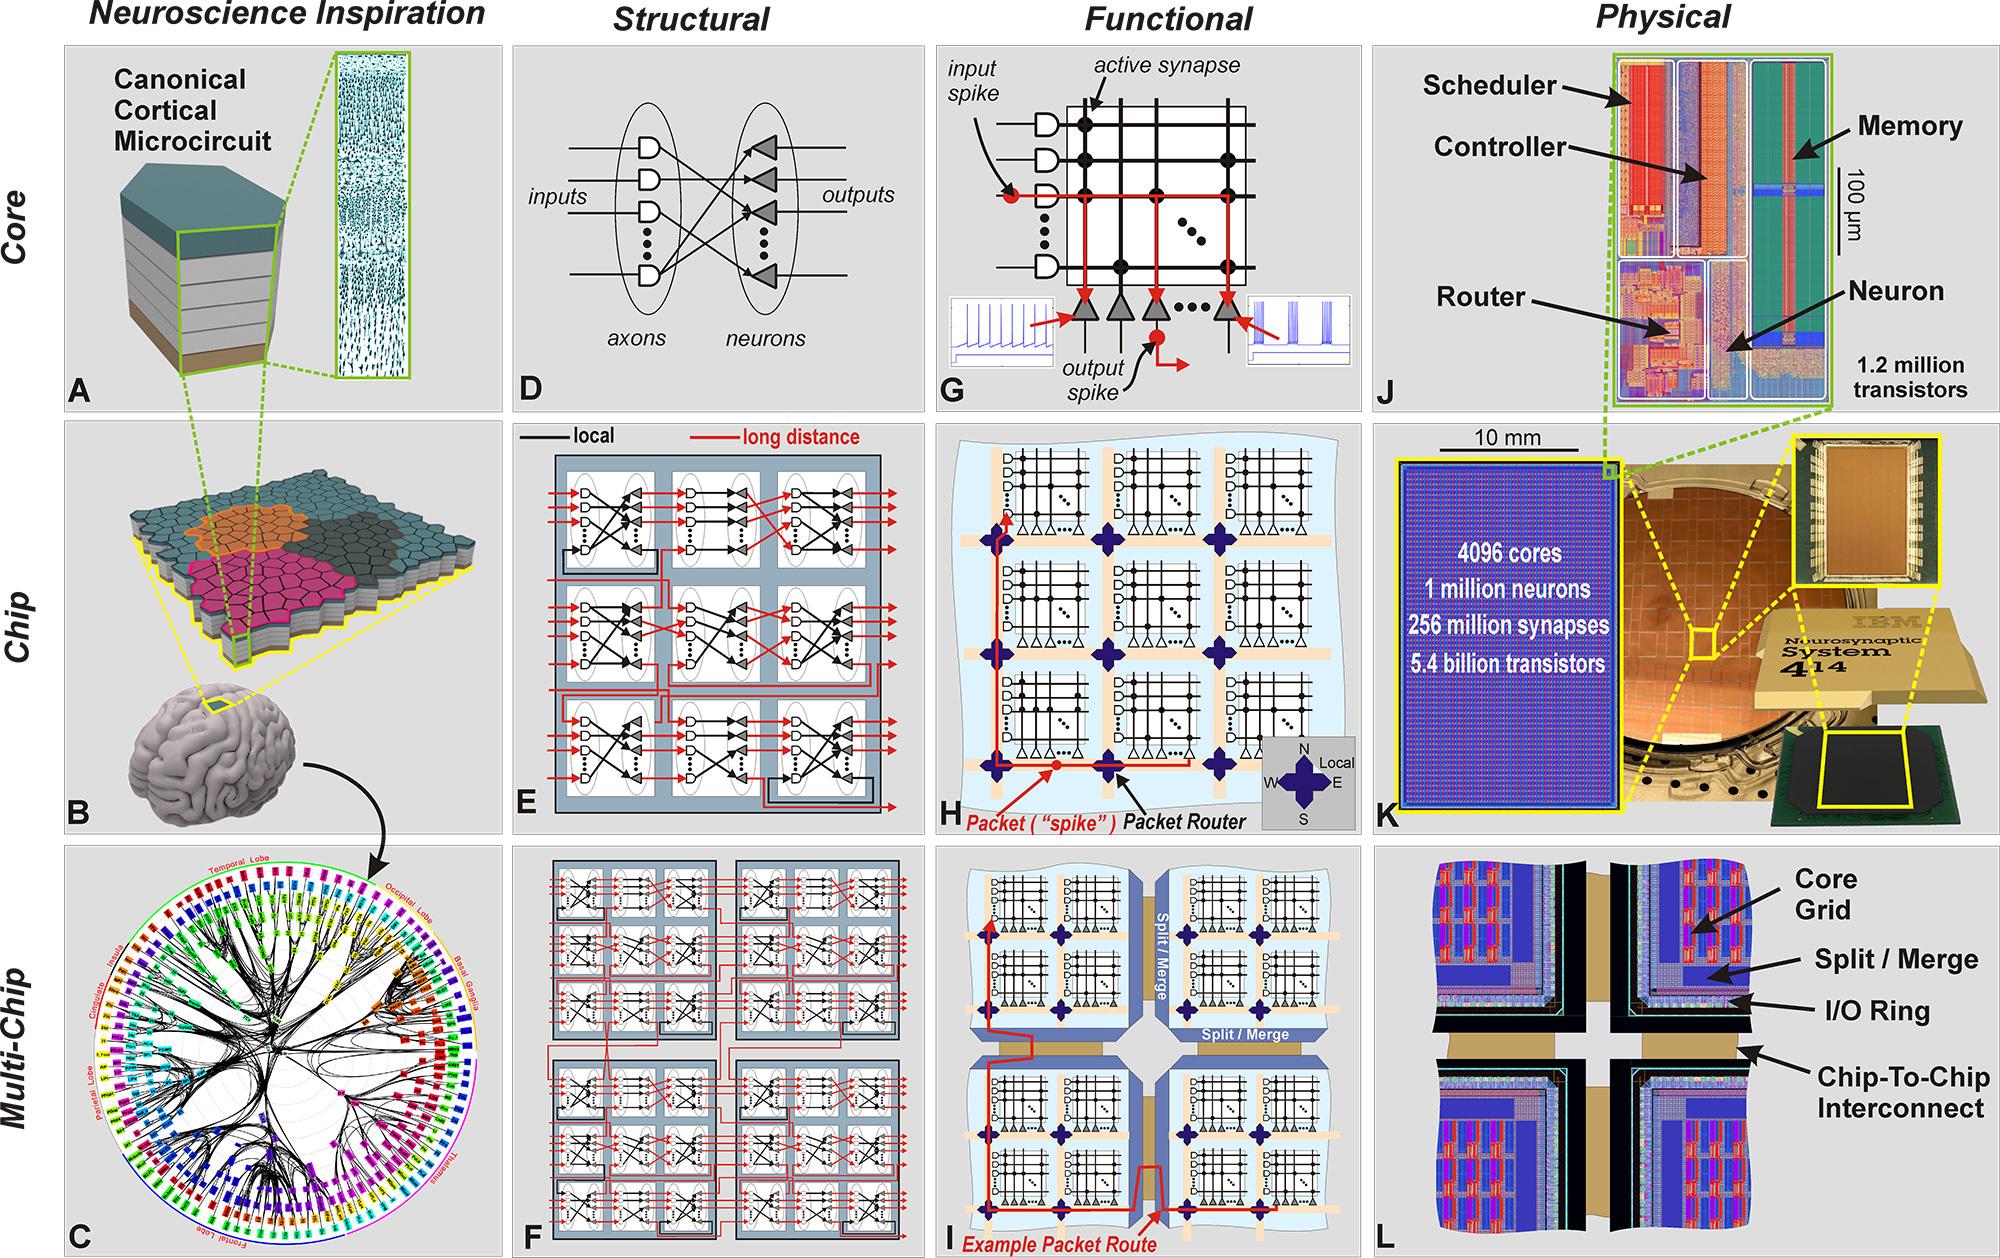 Diagram explaining the various aspects of IBM's TrueNorth chip